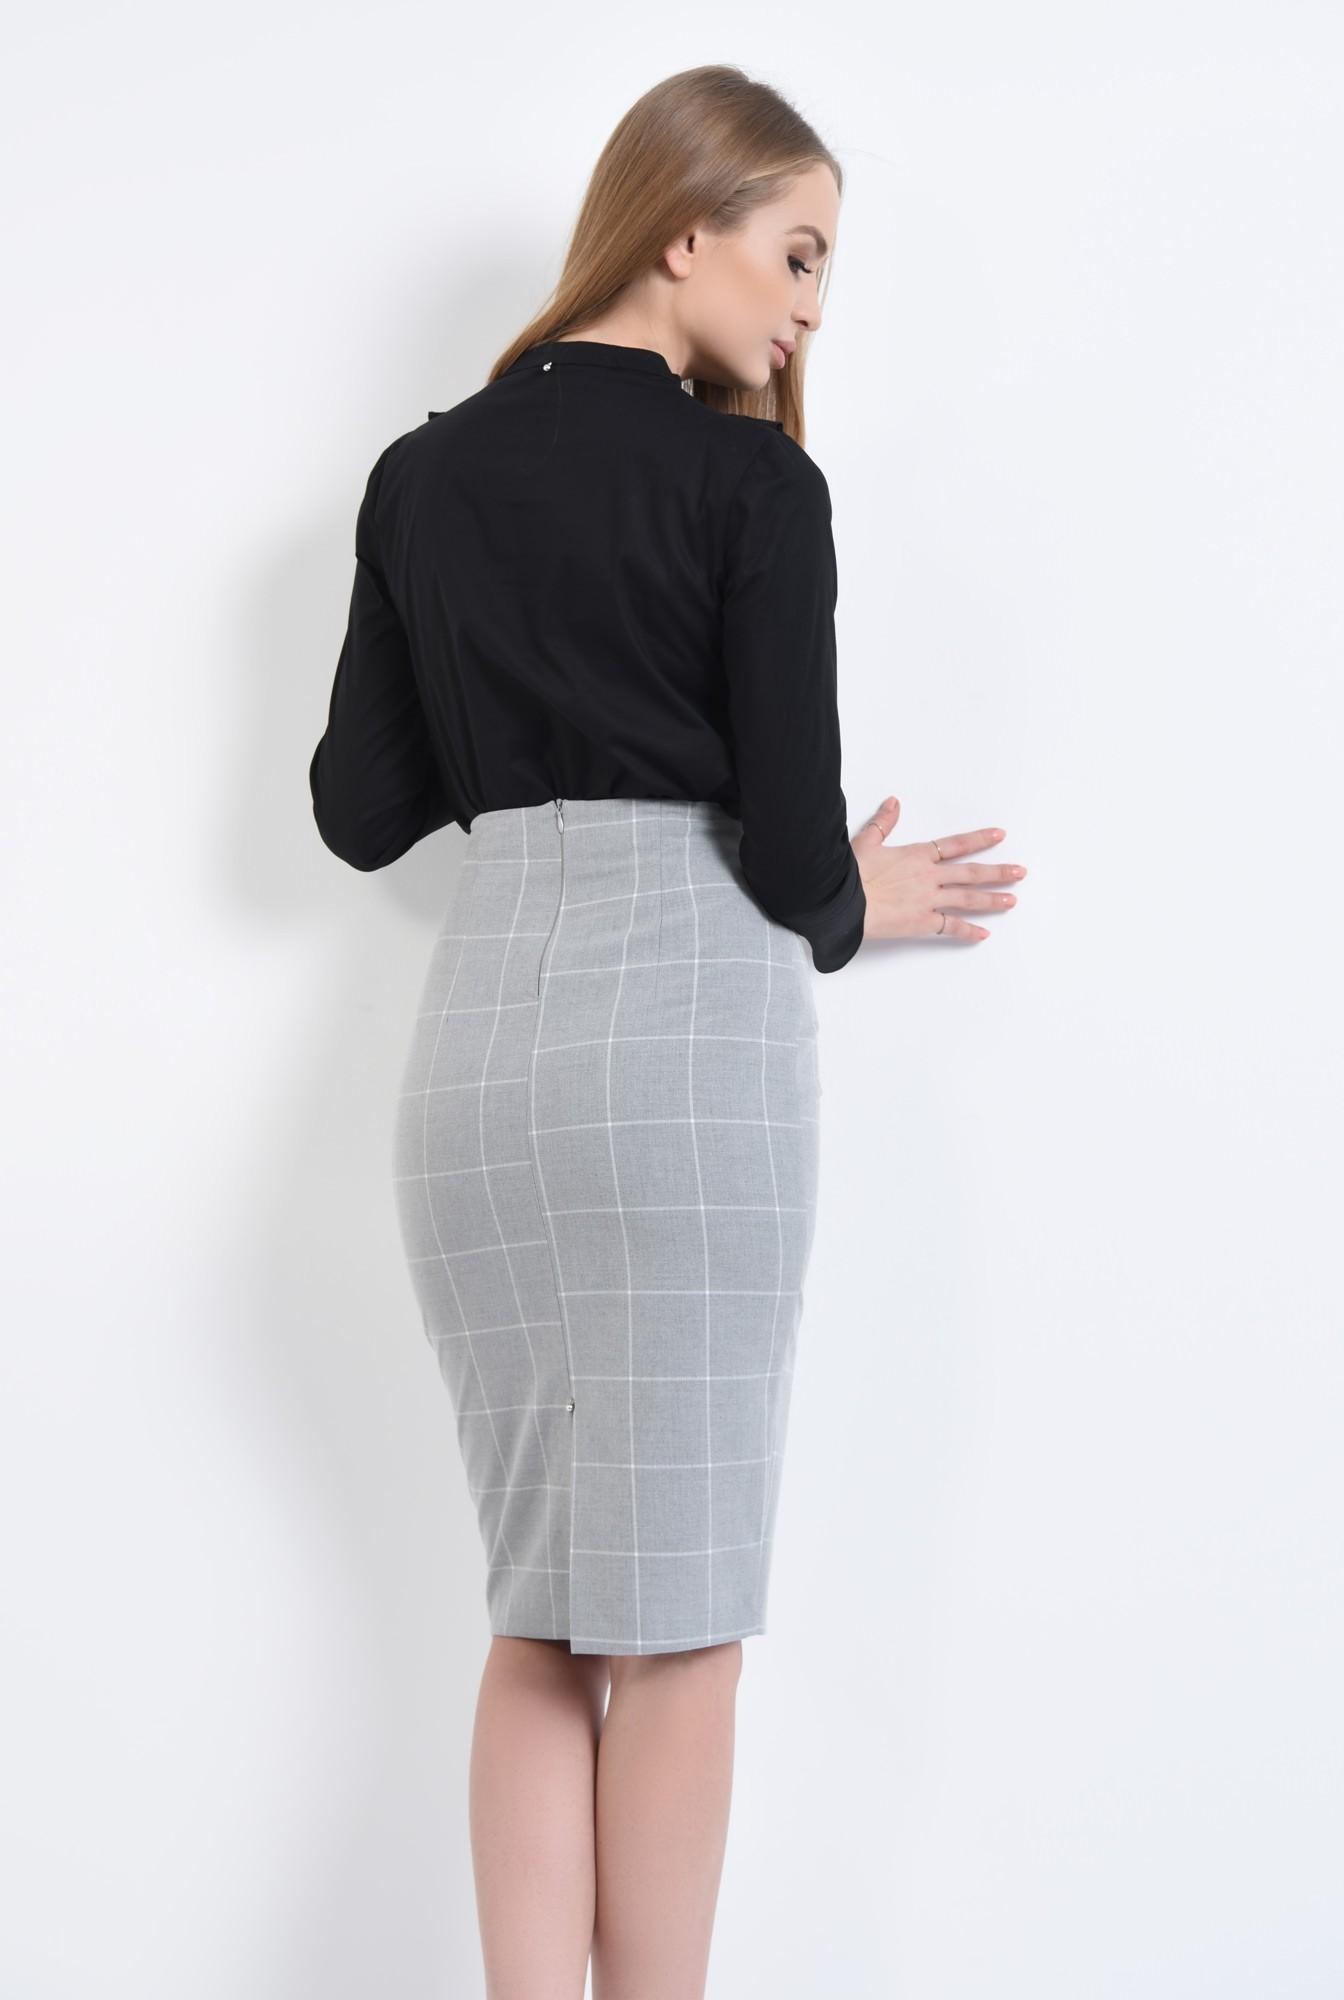 1 - Bluza casual, negru, bumbac